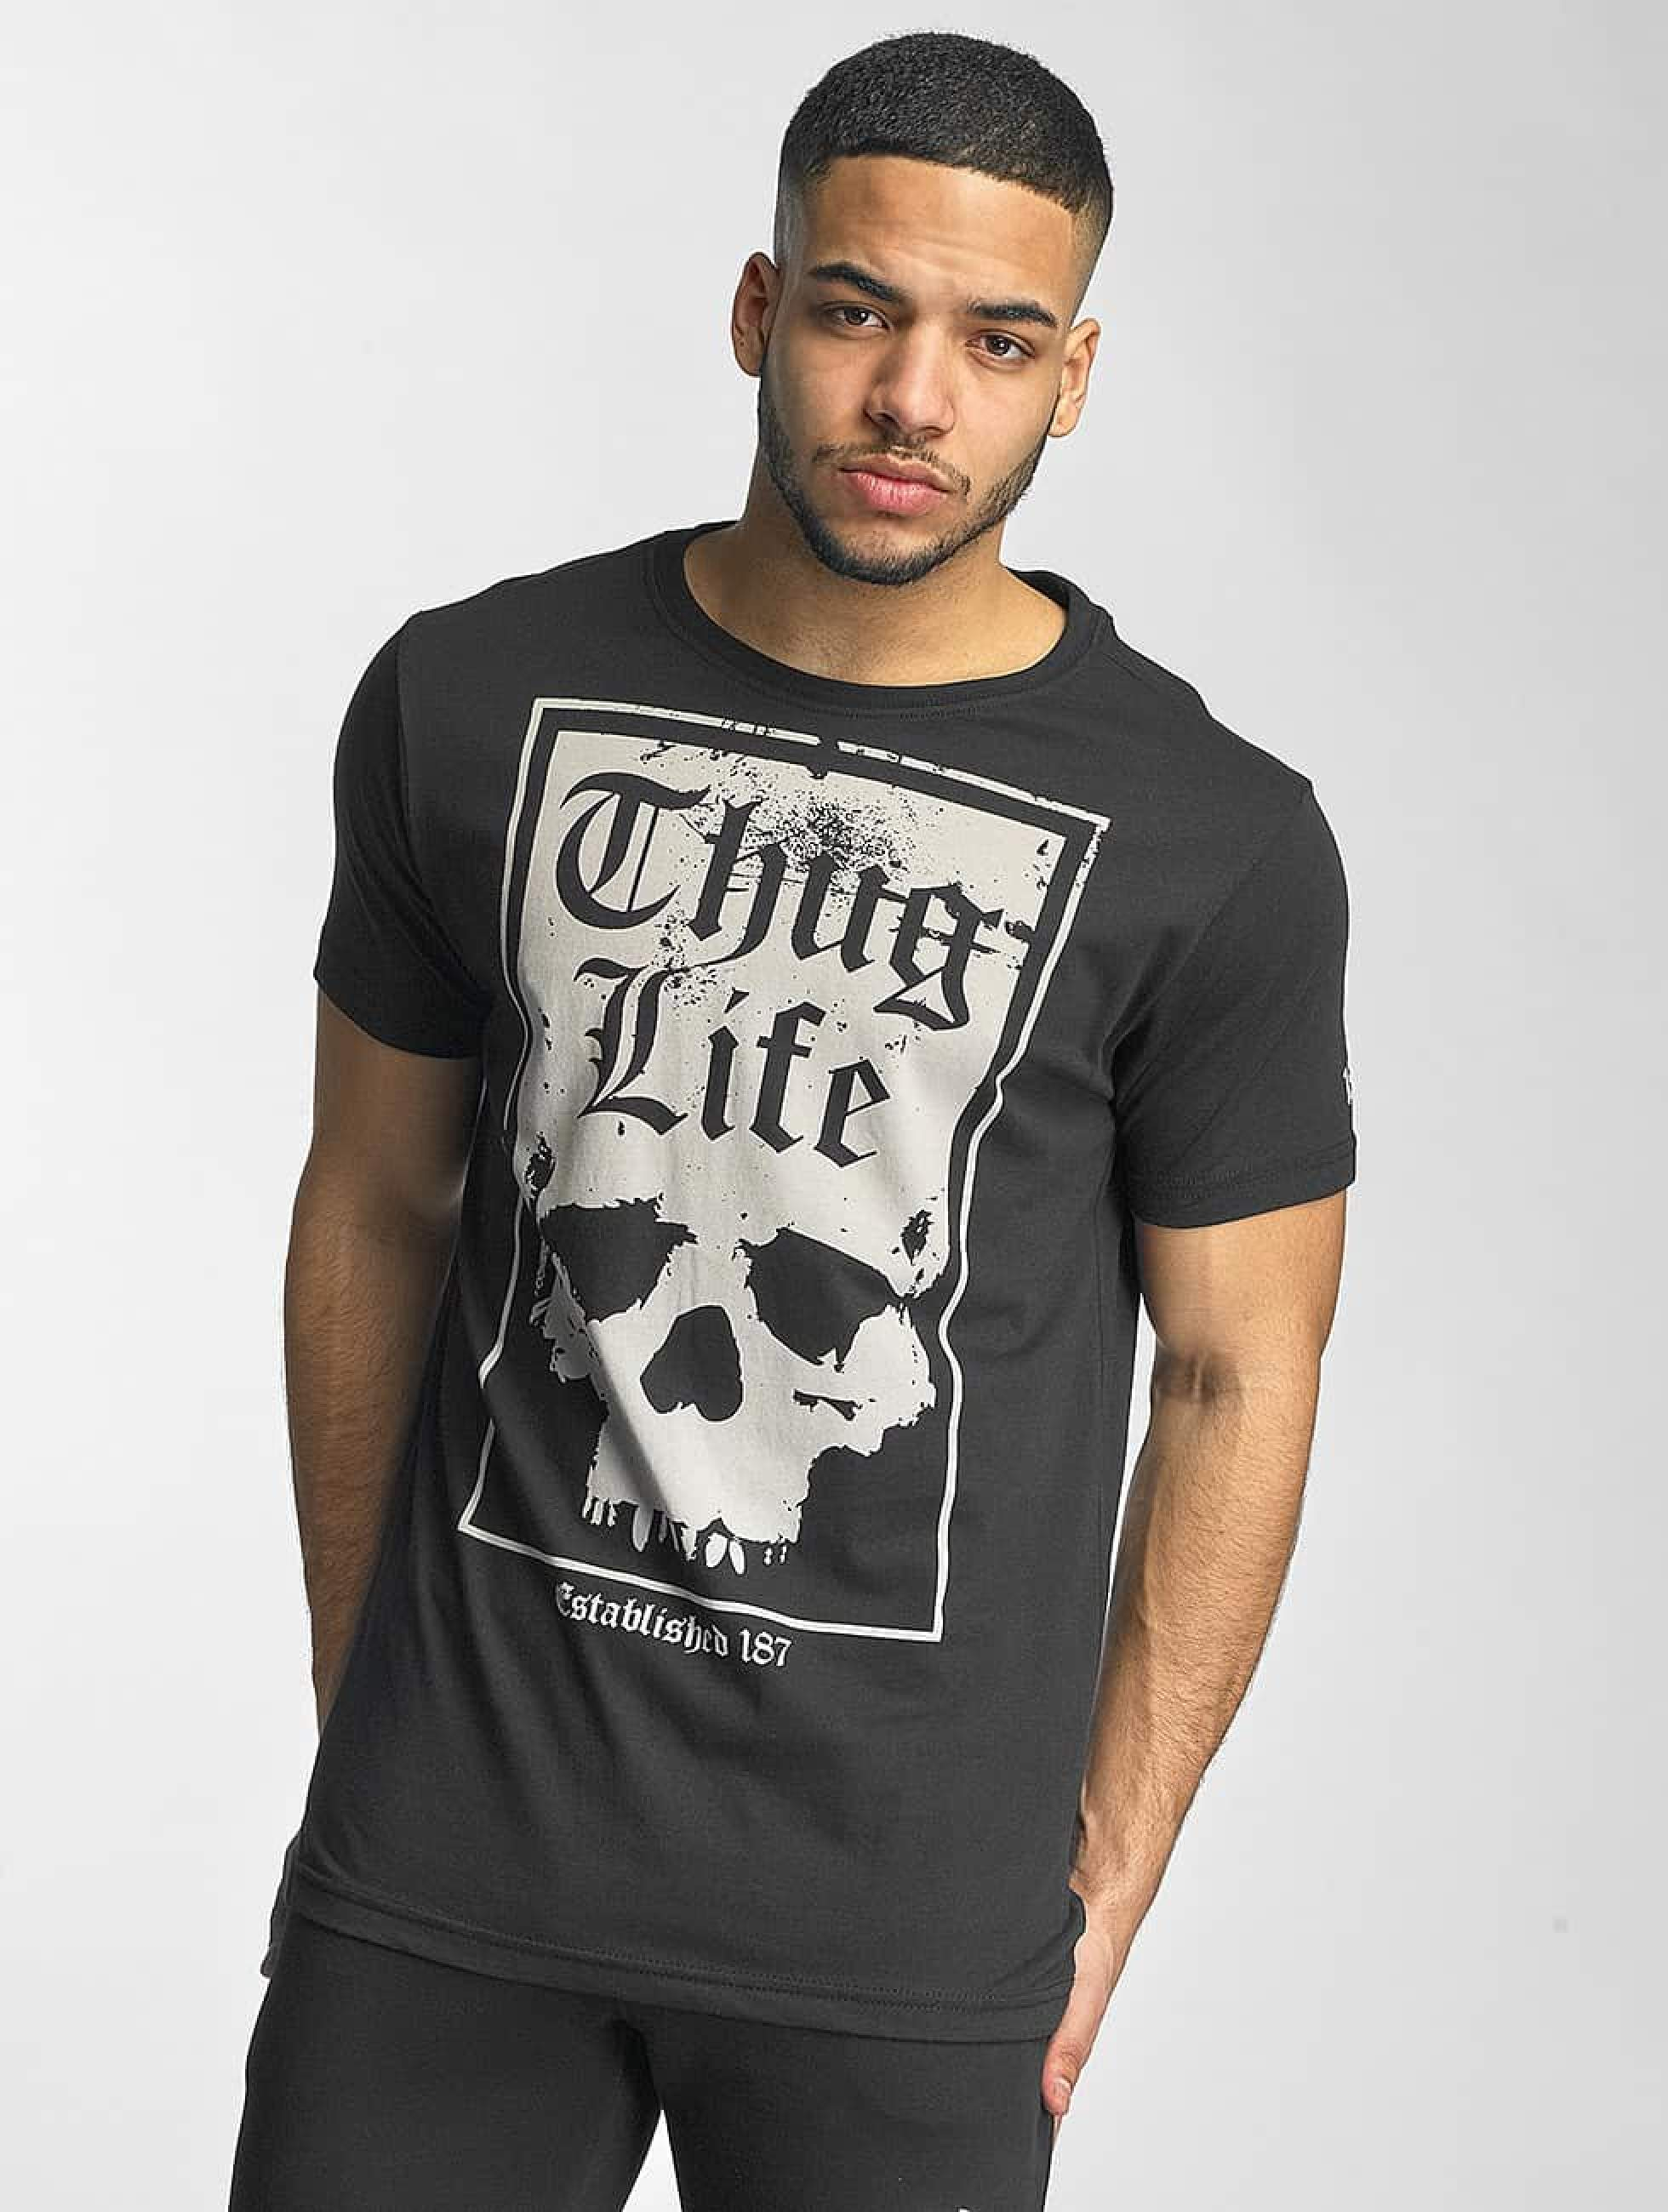 Thug Life / T-Shirt Established 187 in black S